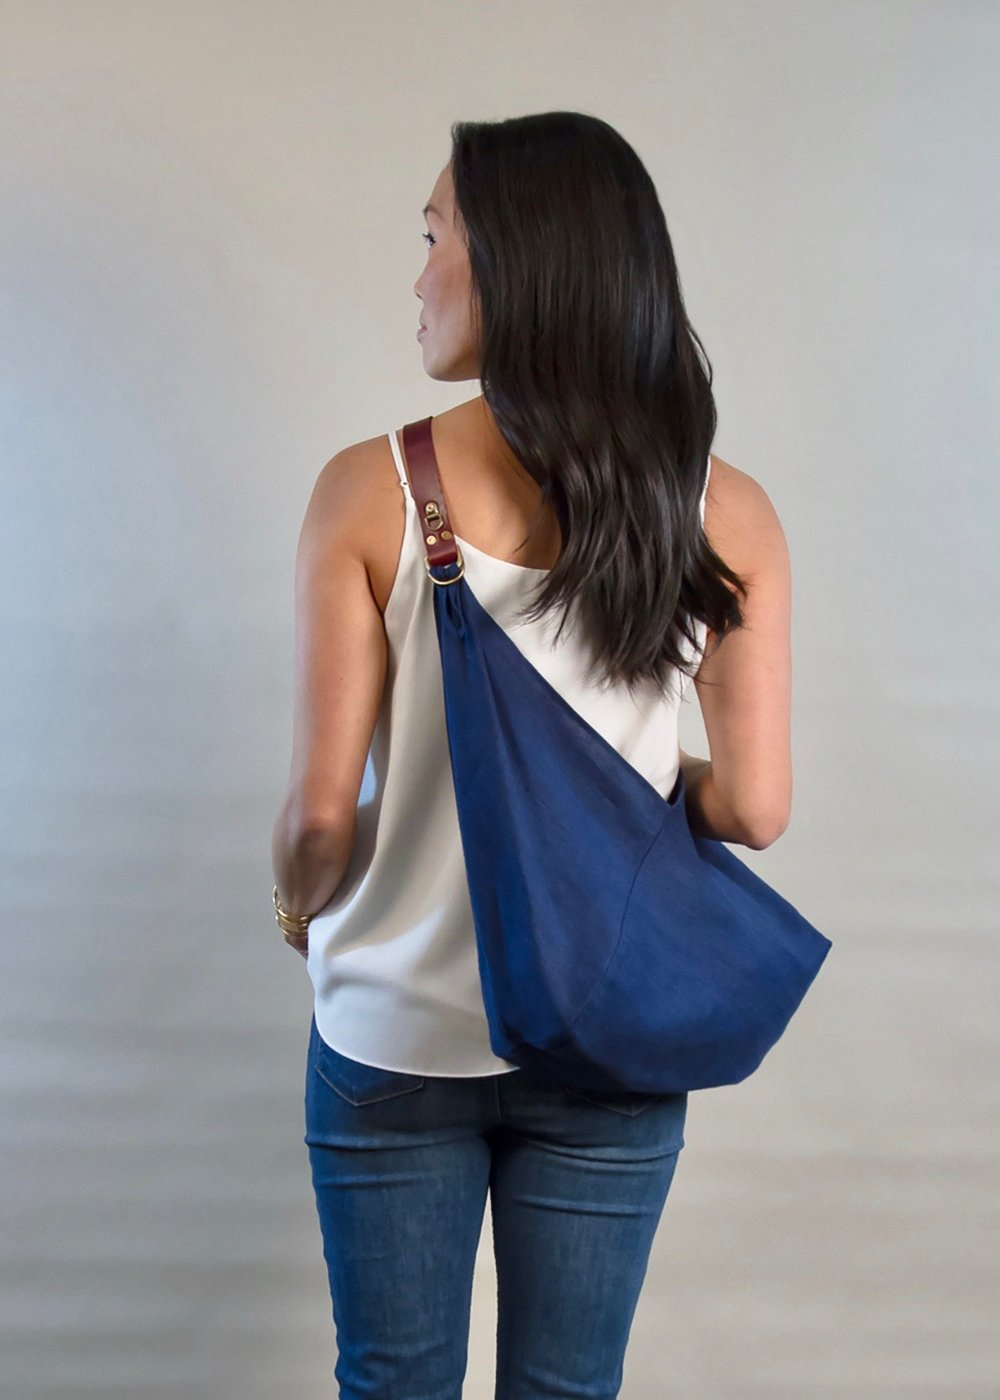 - SMALL LINEN BAG IN INDIGO W/ ORIGINAL HANDLE IN BURGUNDY